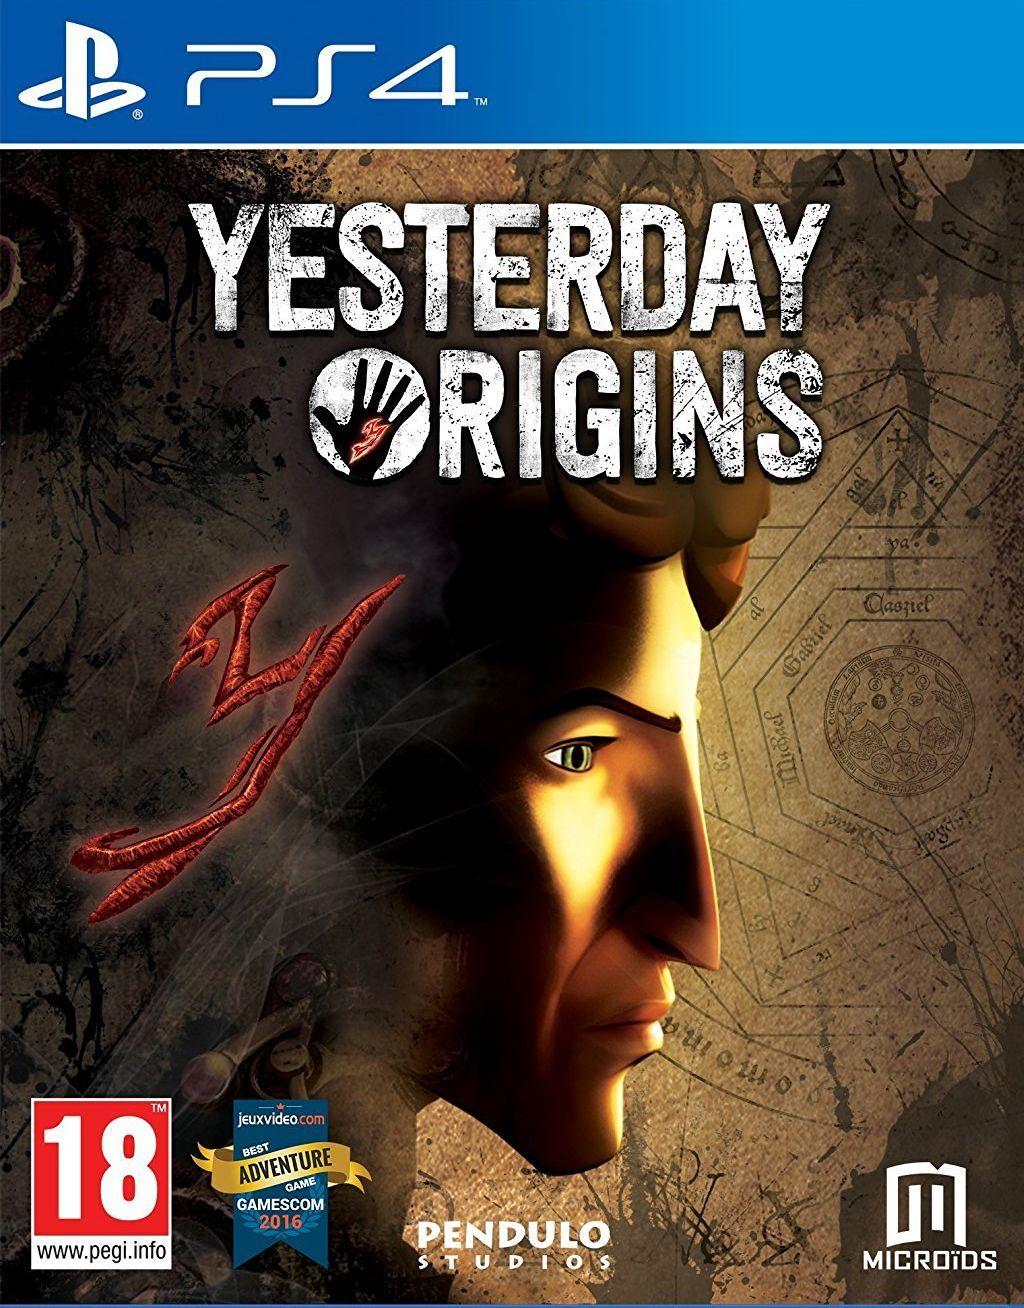 Yesterday Origins (PS4) - 1